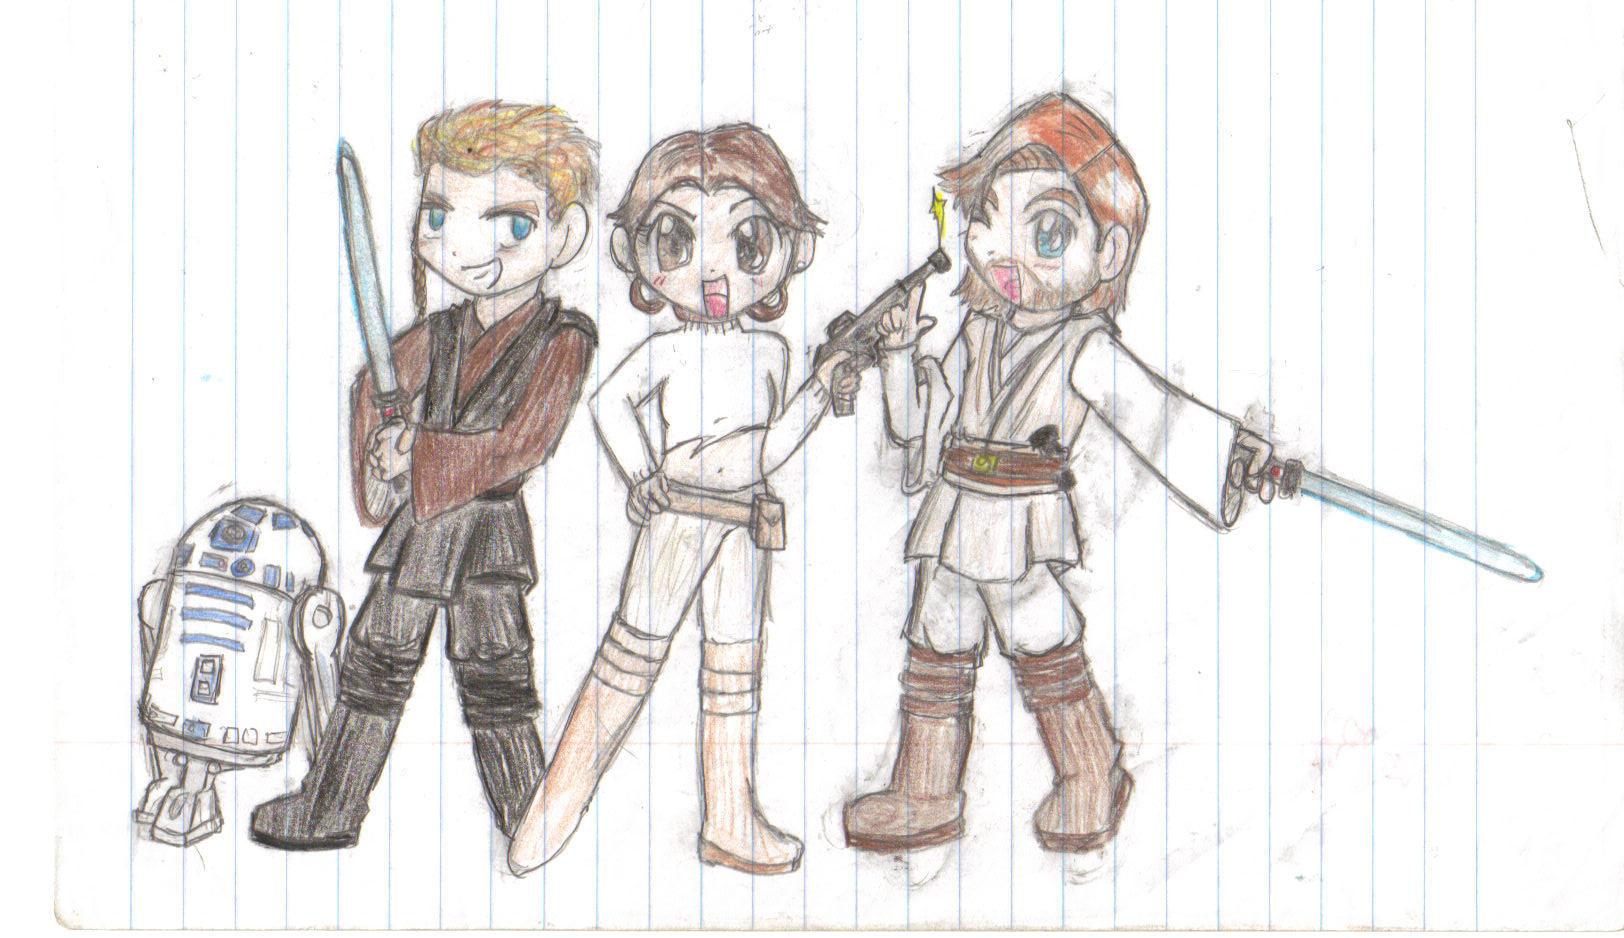 Star Wars Jedi Drawings an Error Occurred